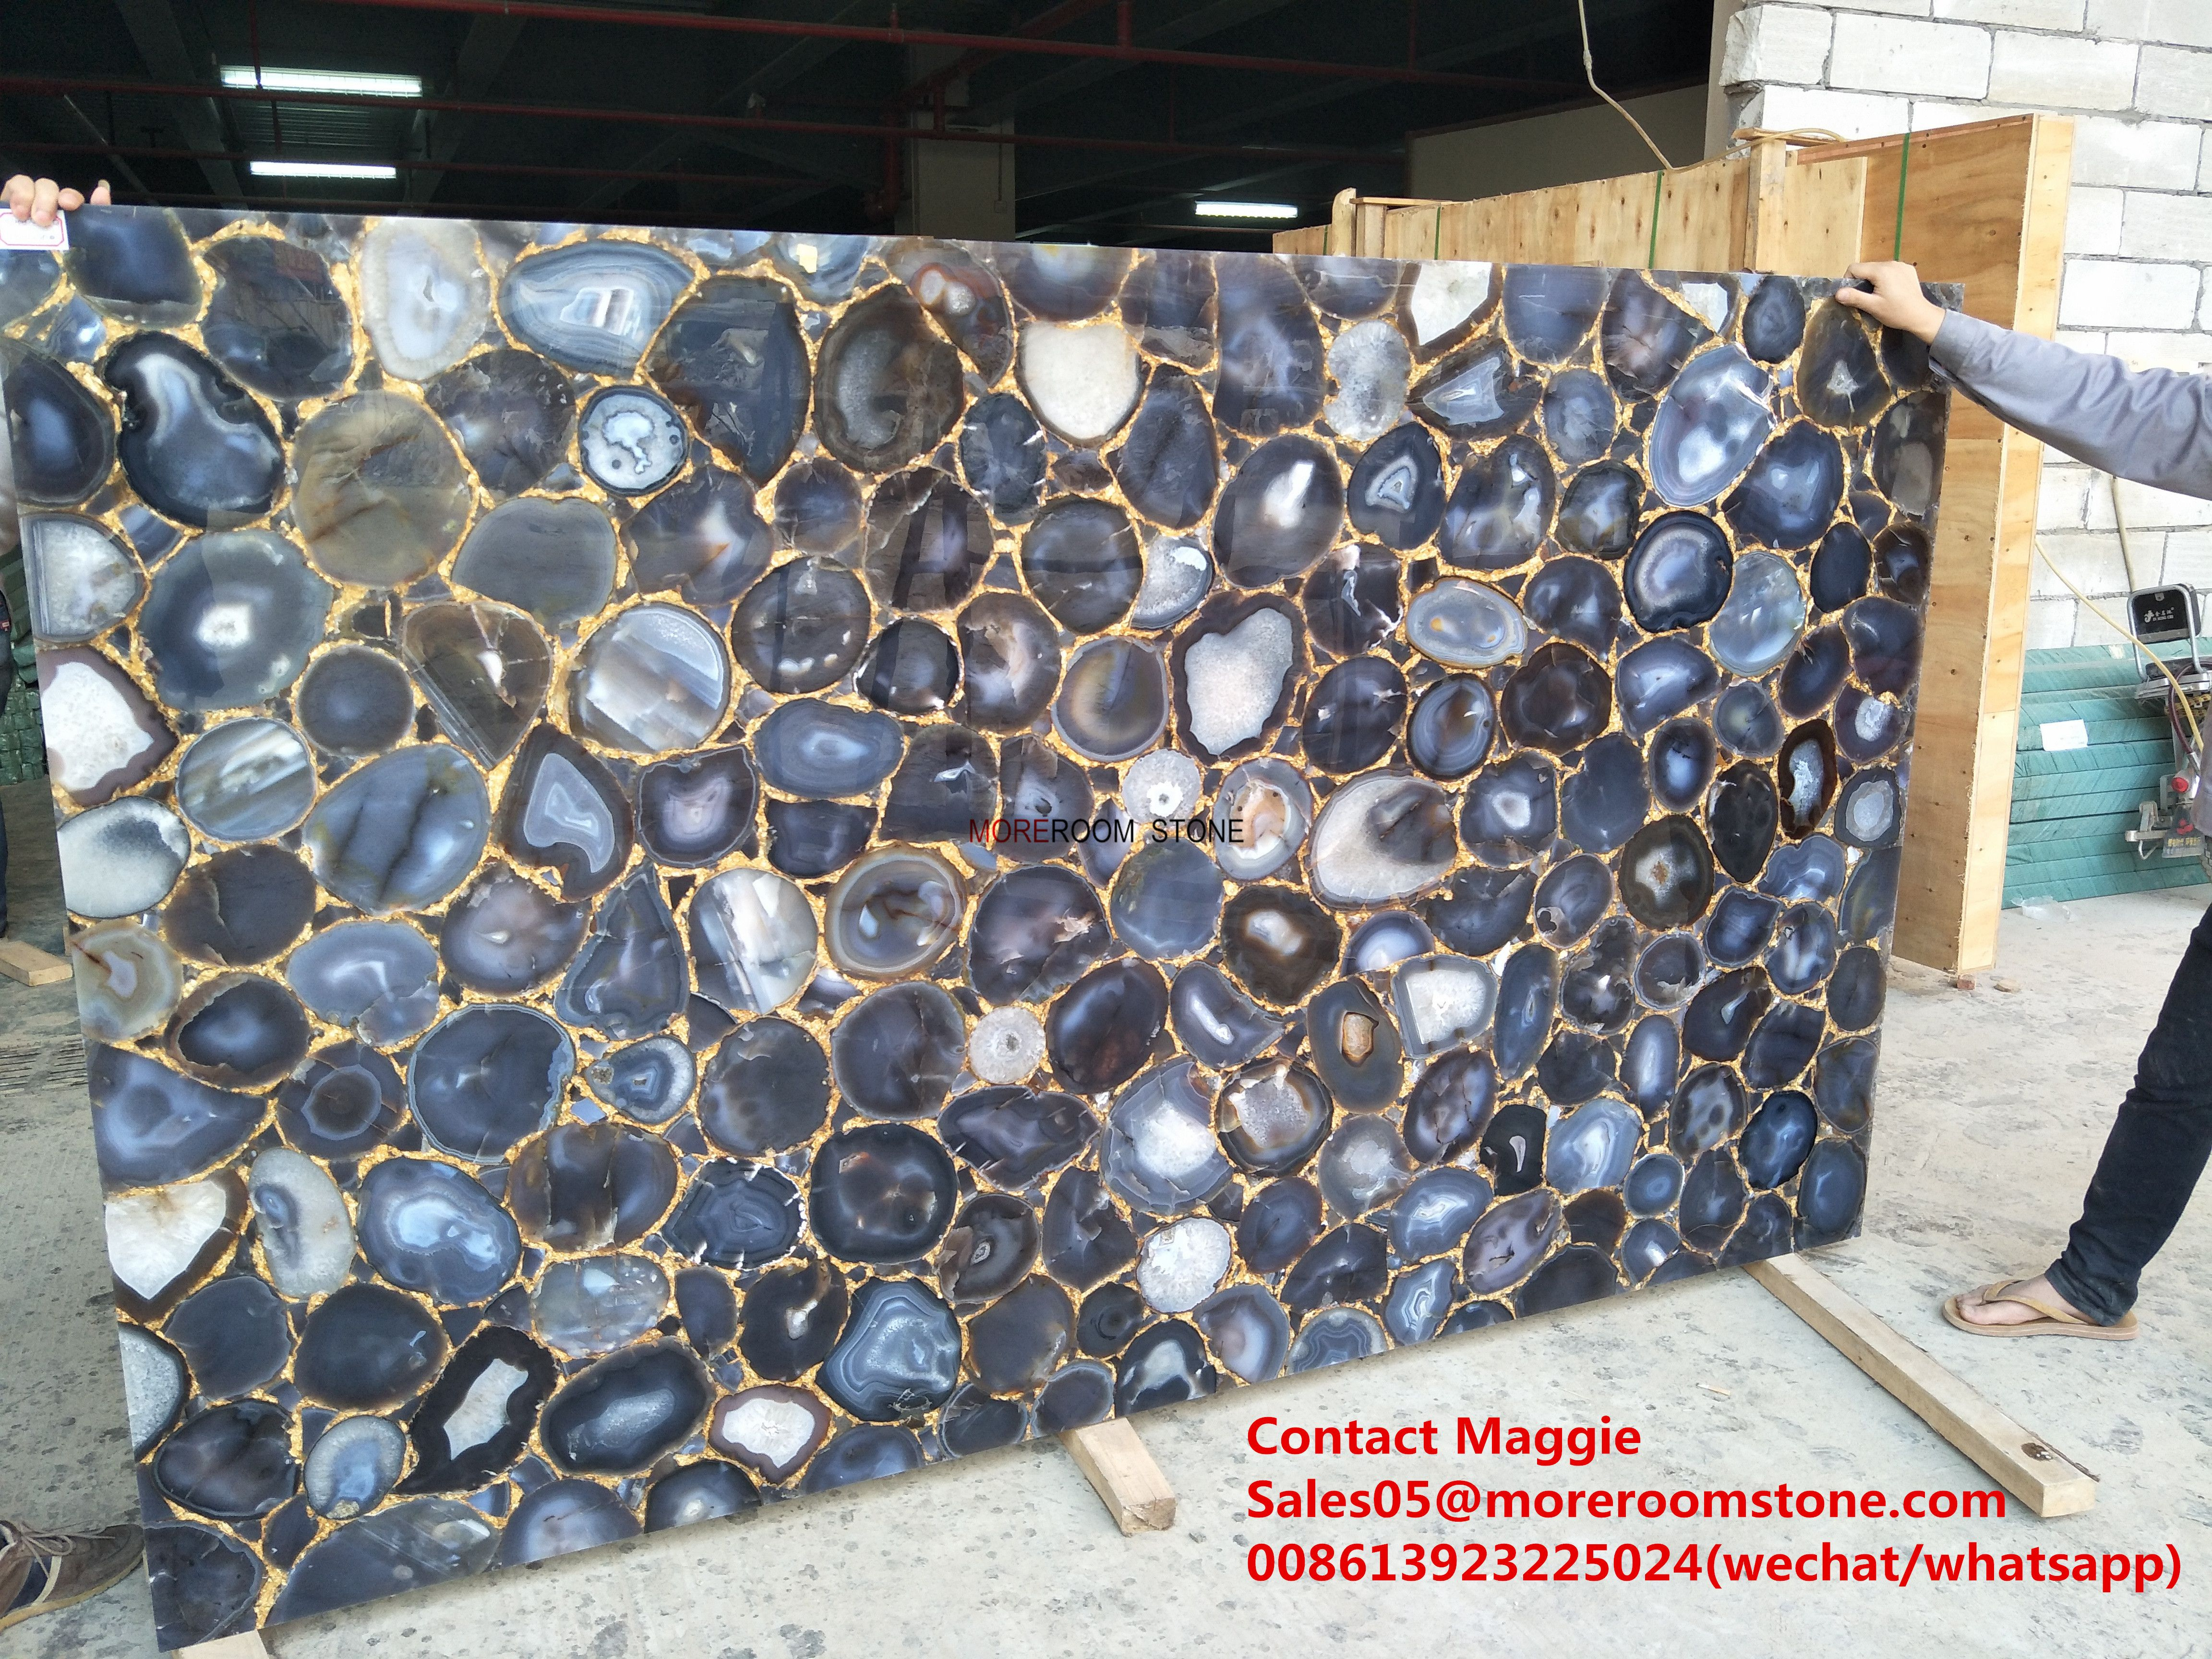 Grey Agate Slab Semi Precious Stone Natural For Wall And Countertop